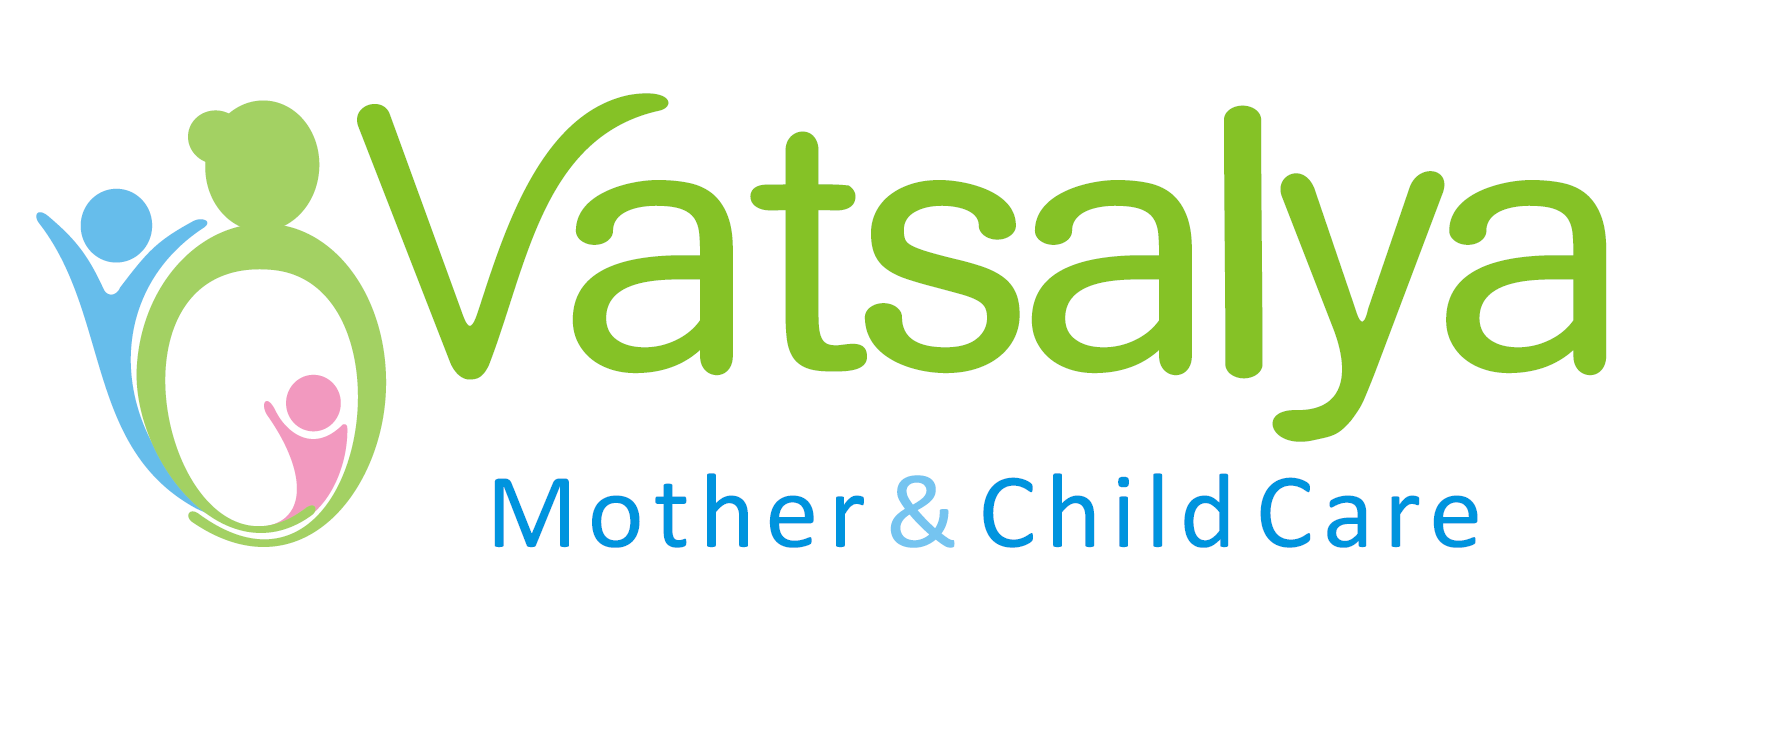 Vatsalya Mother & Child Care